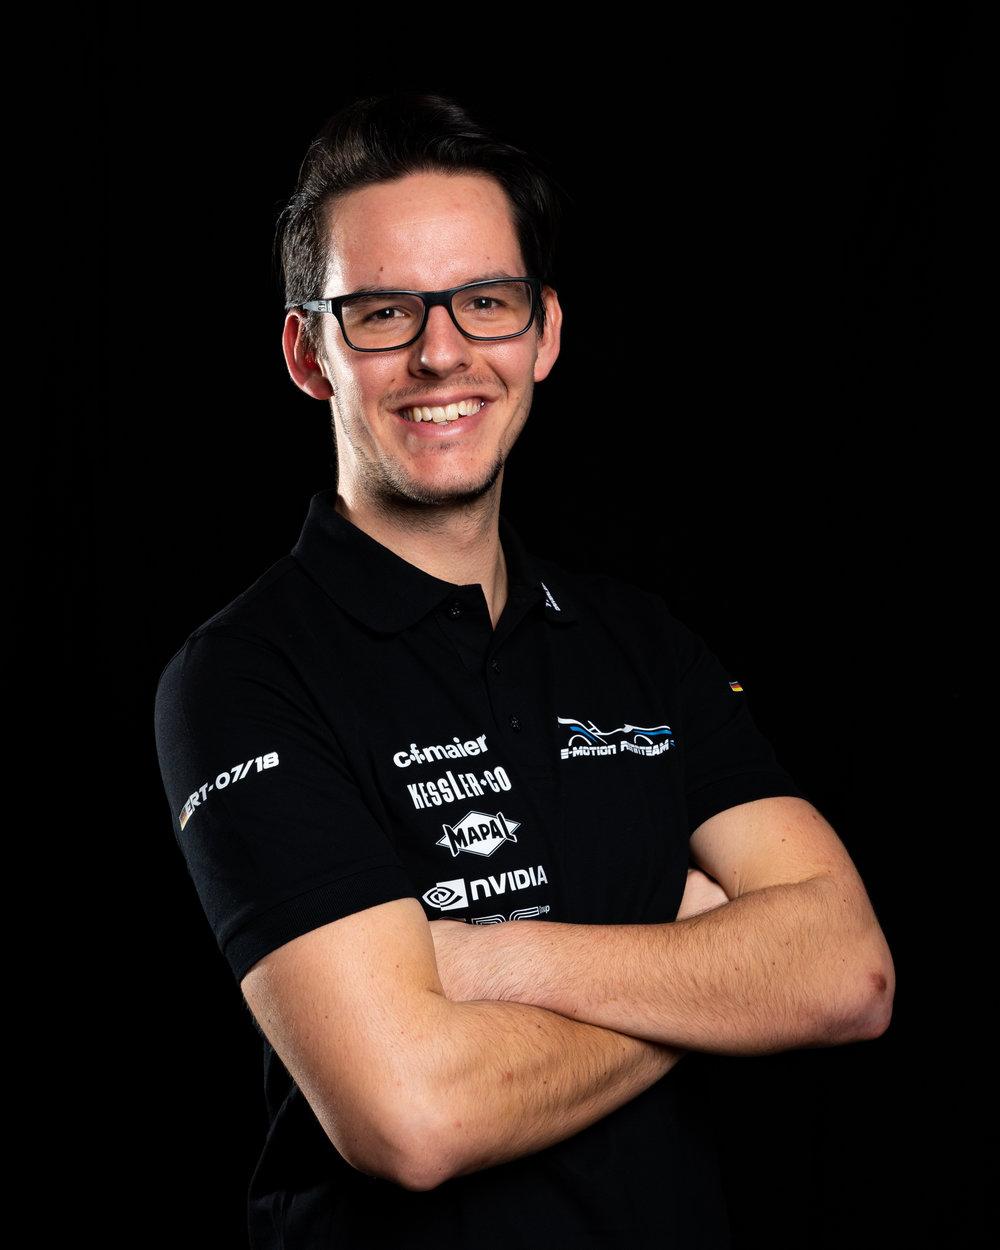 Markus Eberle